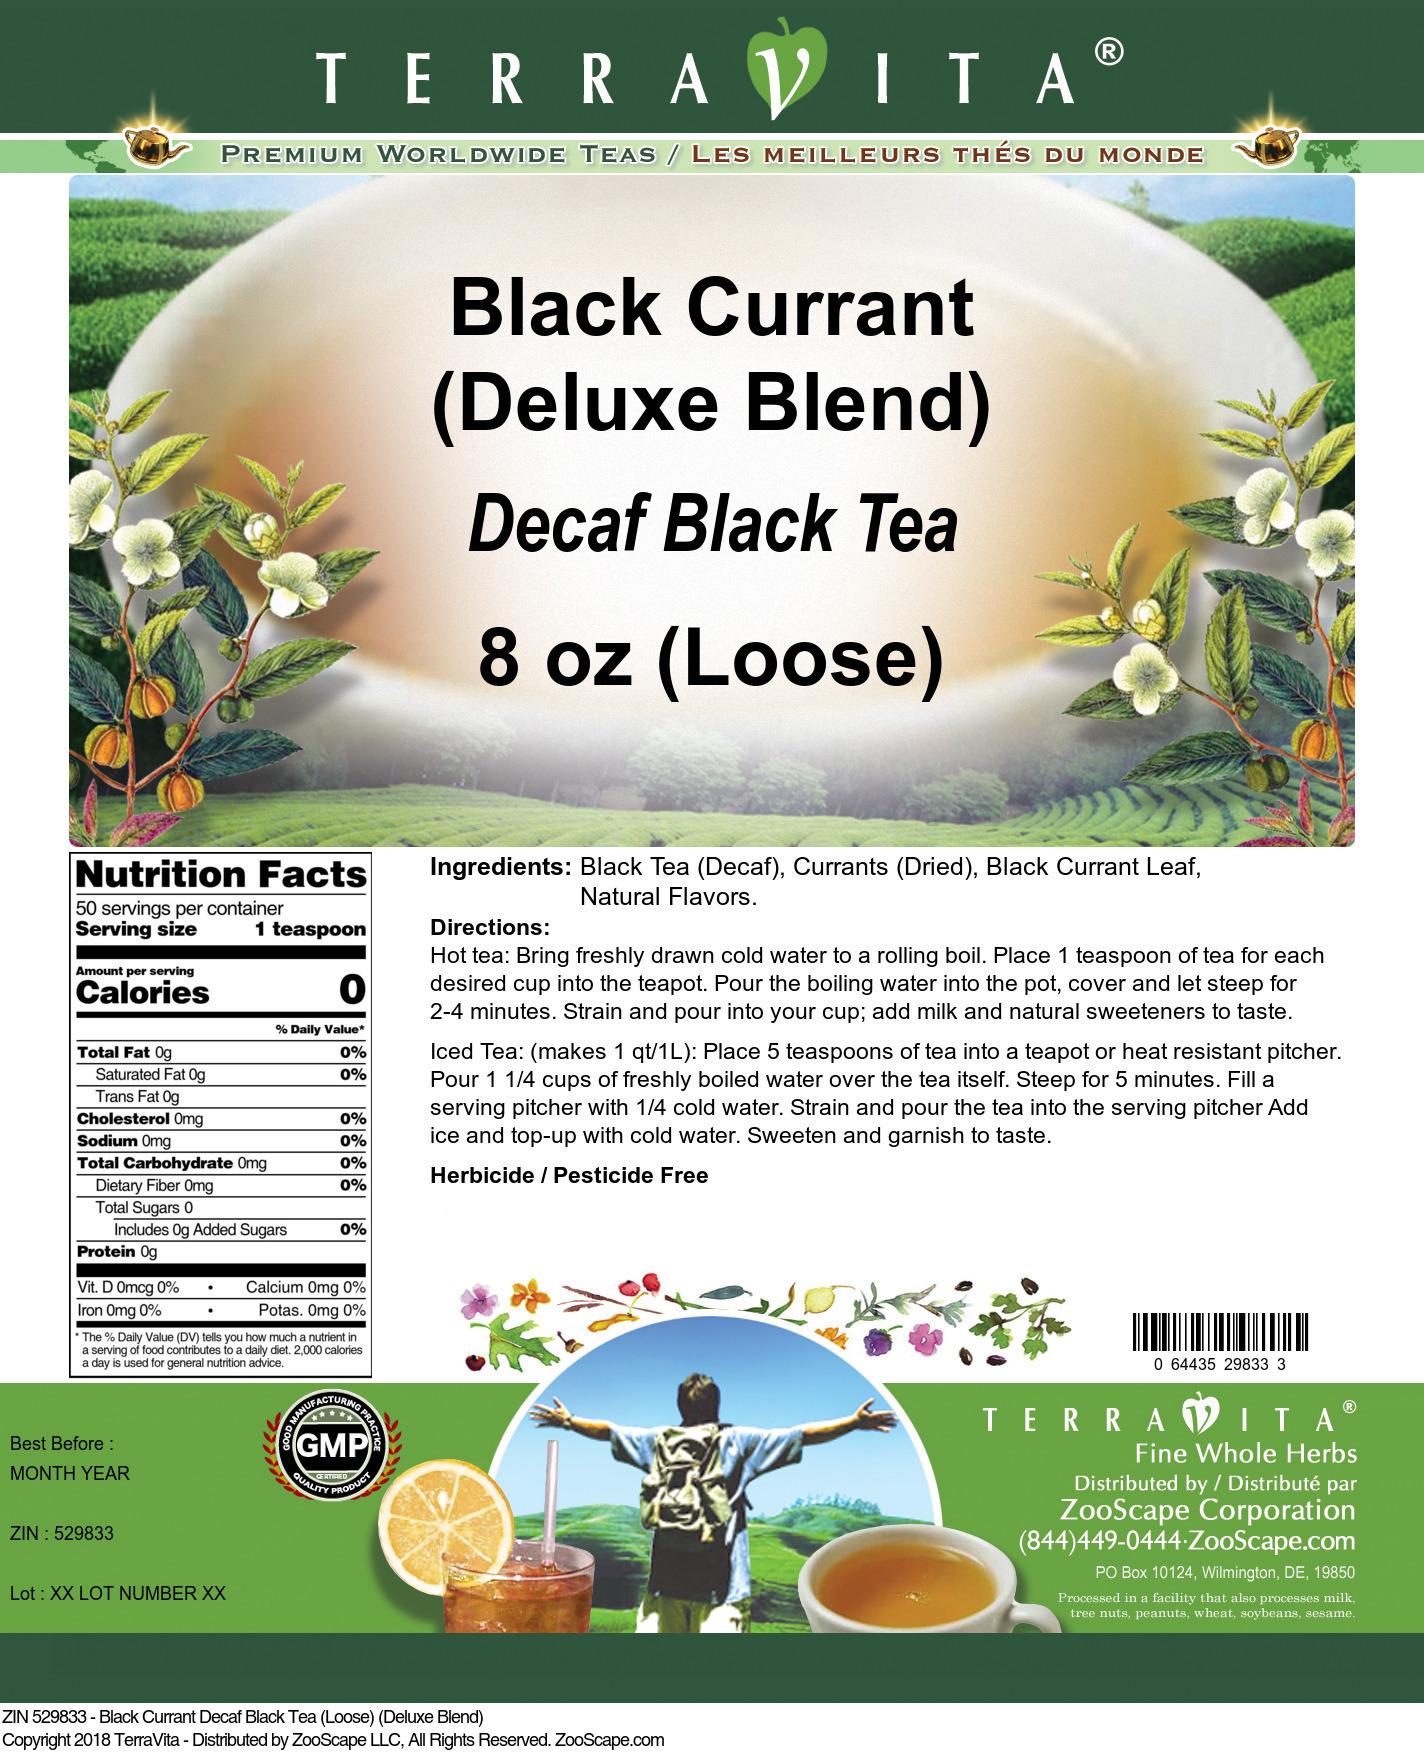 Black Currant Decaf Black Tea (Loose) (Deluxe Blend)